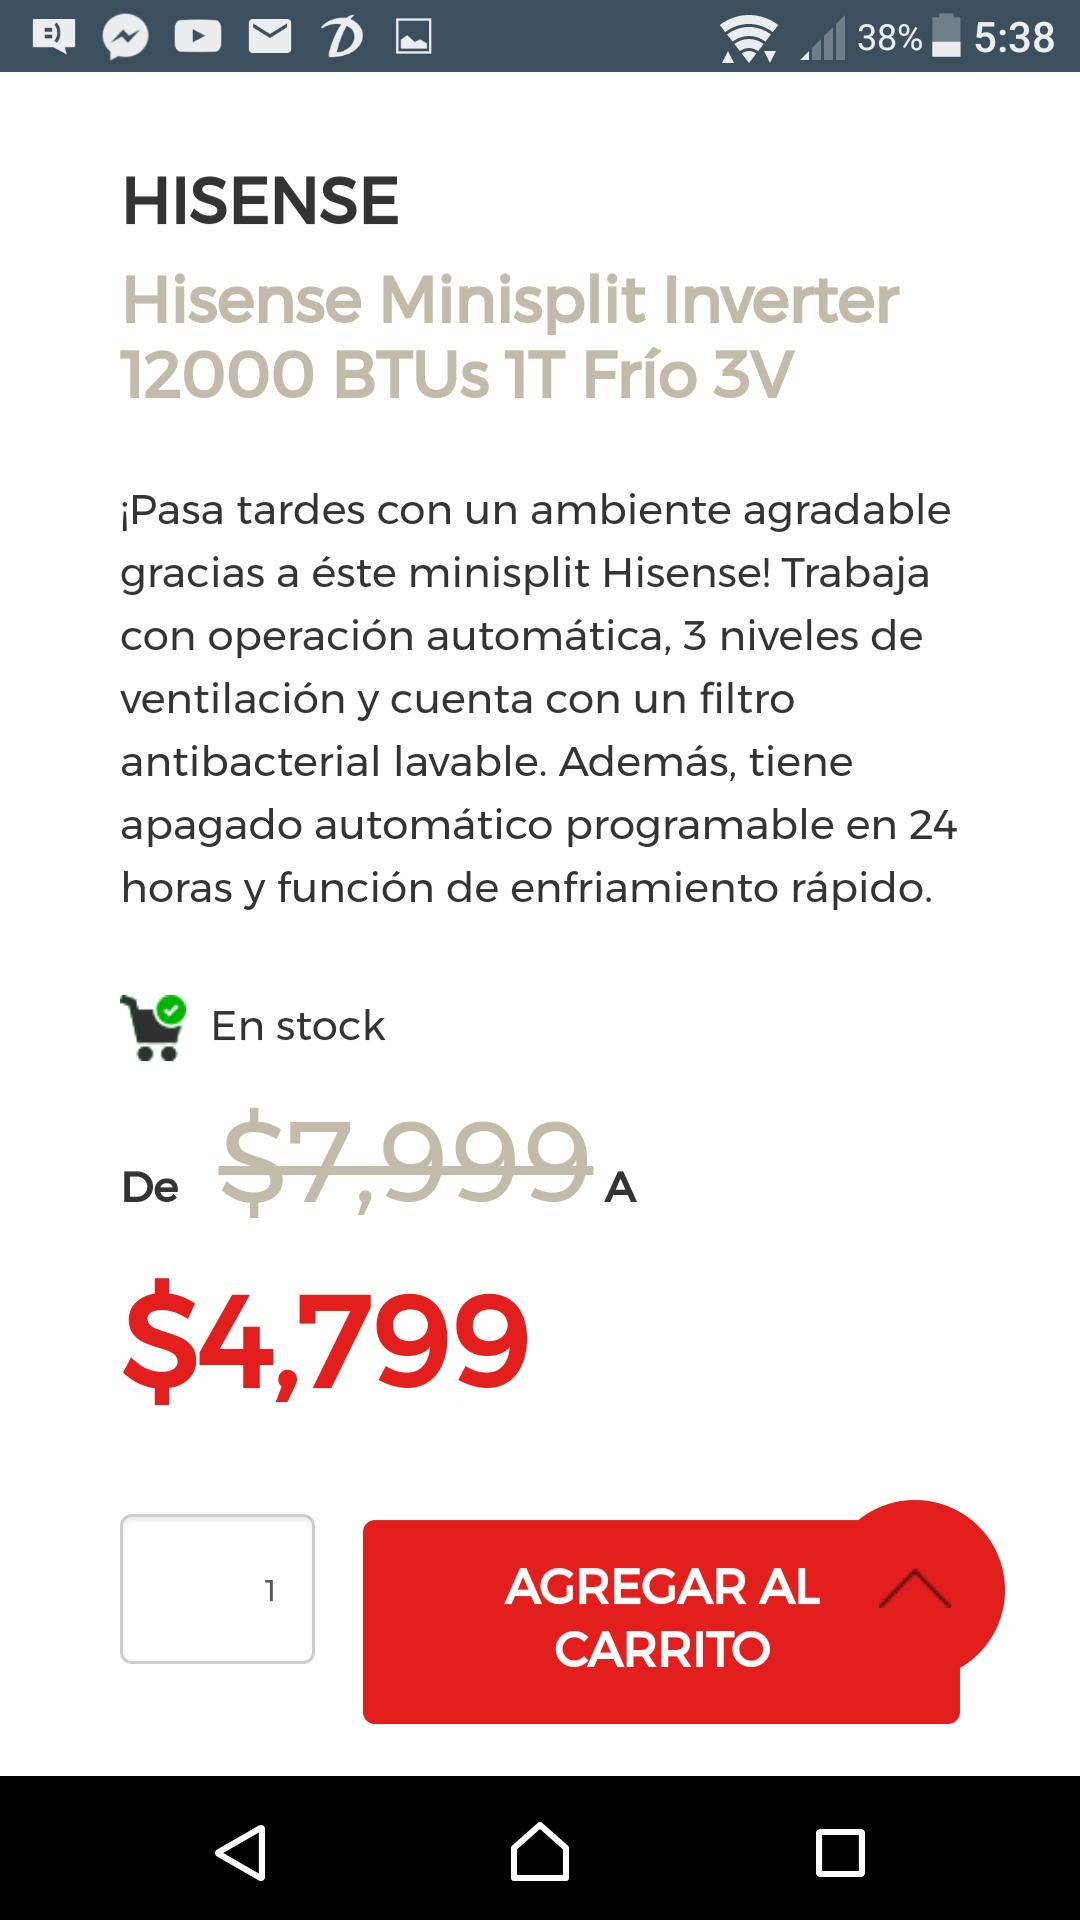 Elektra: Mini Split Inverter Hisense-minisplit-inverter-12000-btus-1t-frío-3v